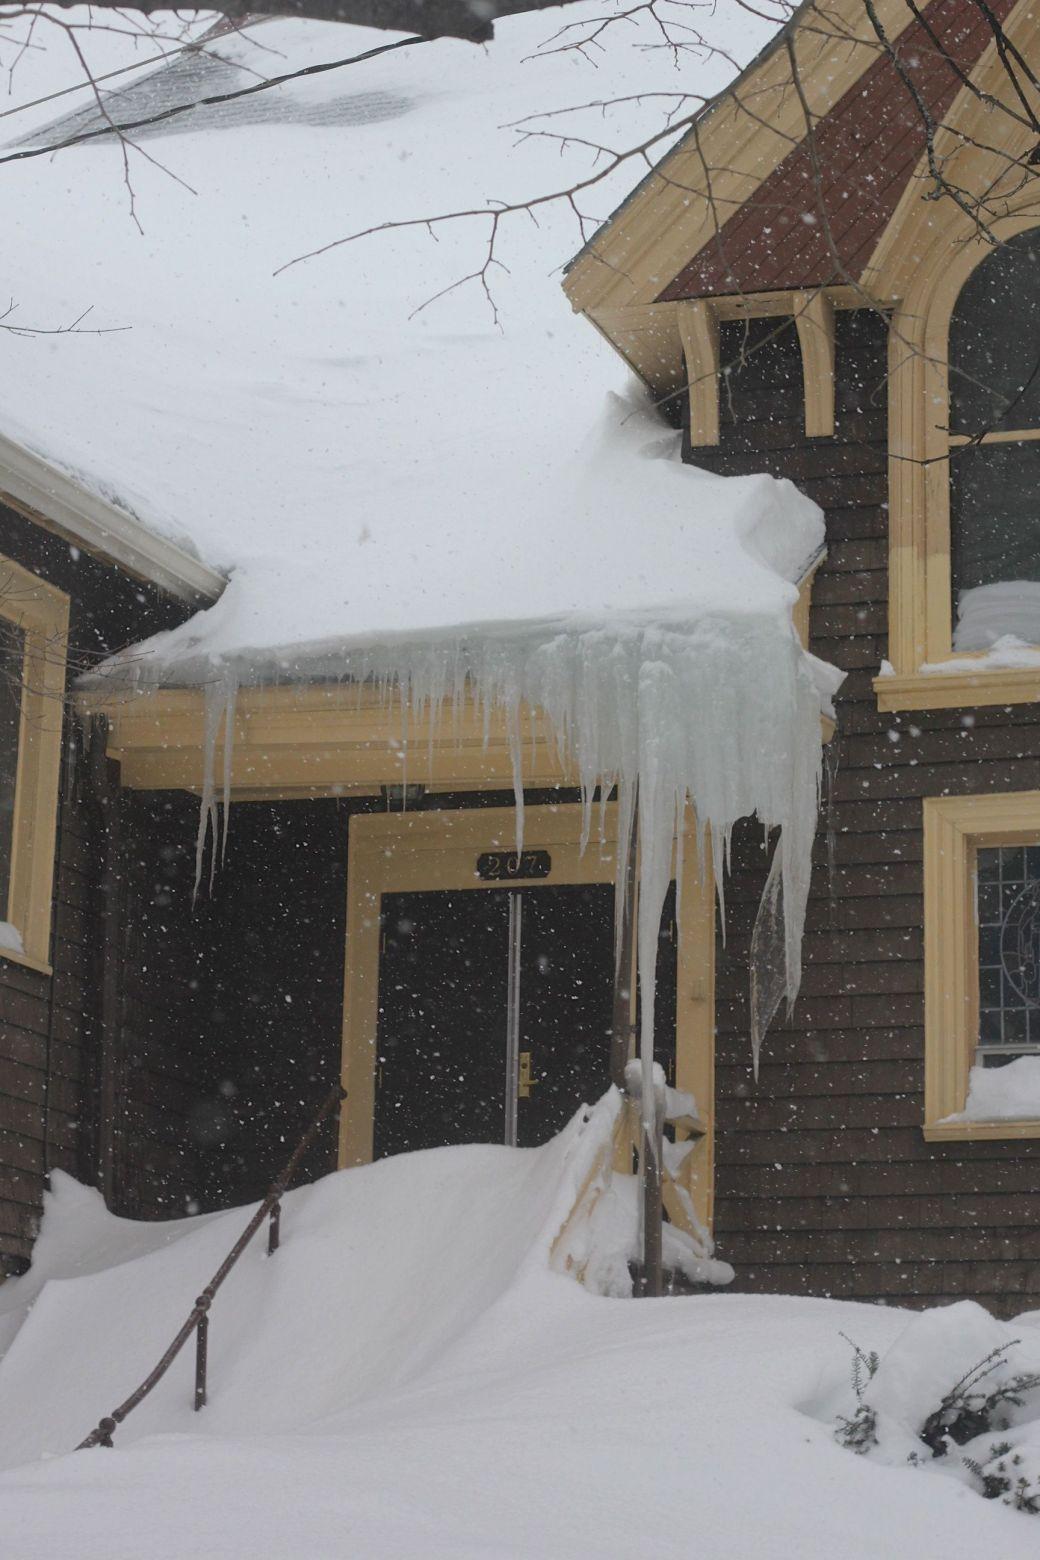 boston jamaica plain winter february 17 2015 church icicles